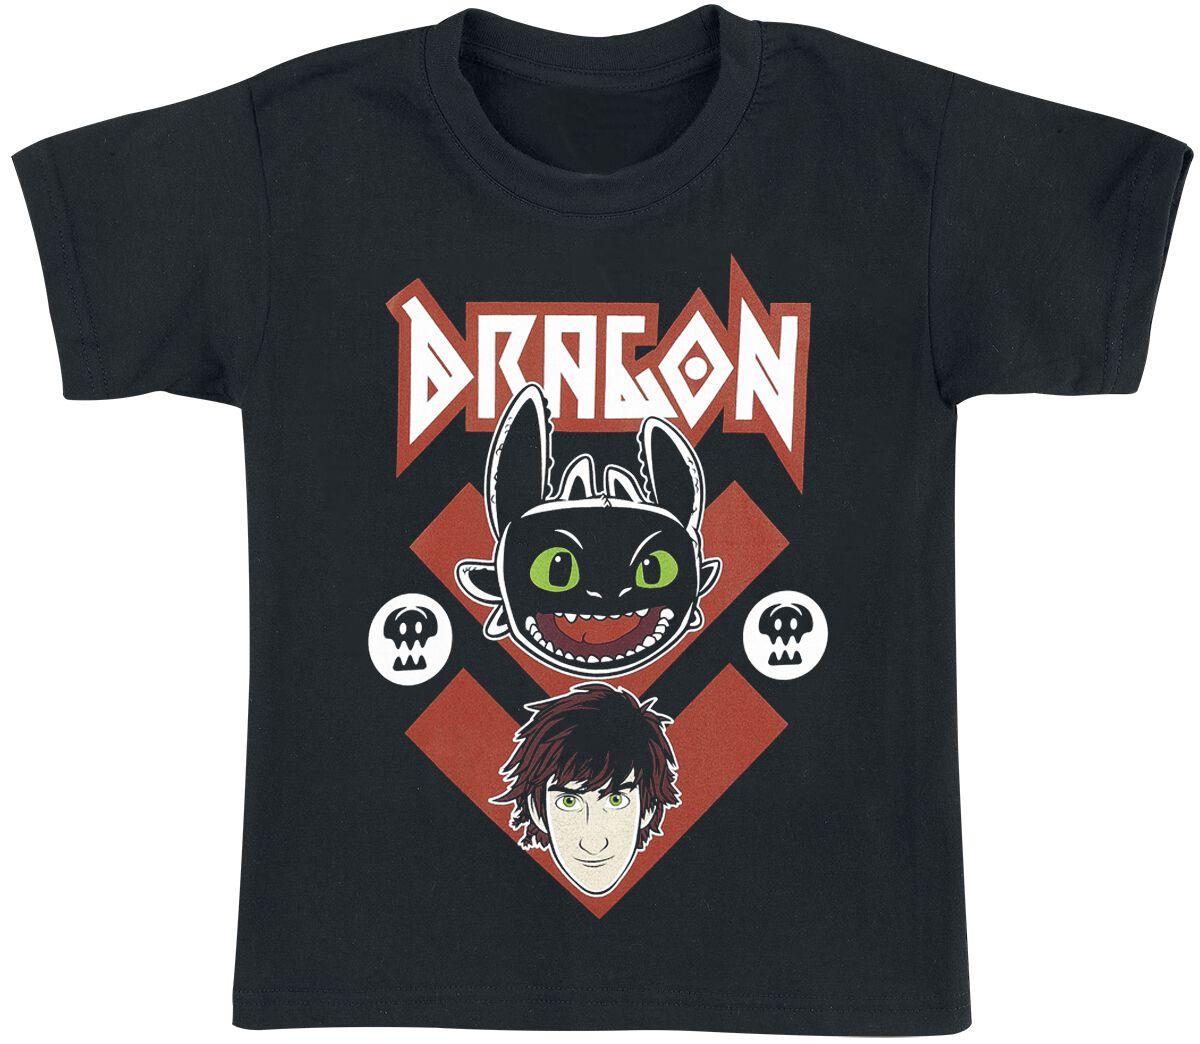 Drachenzähmen leicht gemacht Toothless T-Shirt schwarz #03006